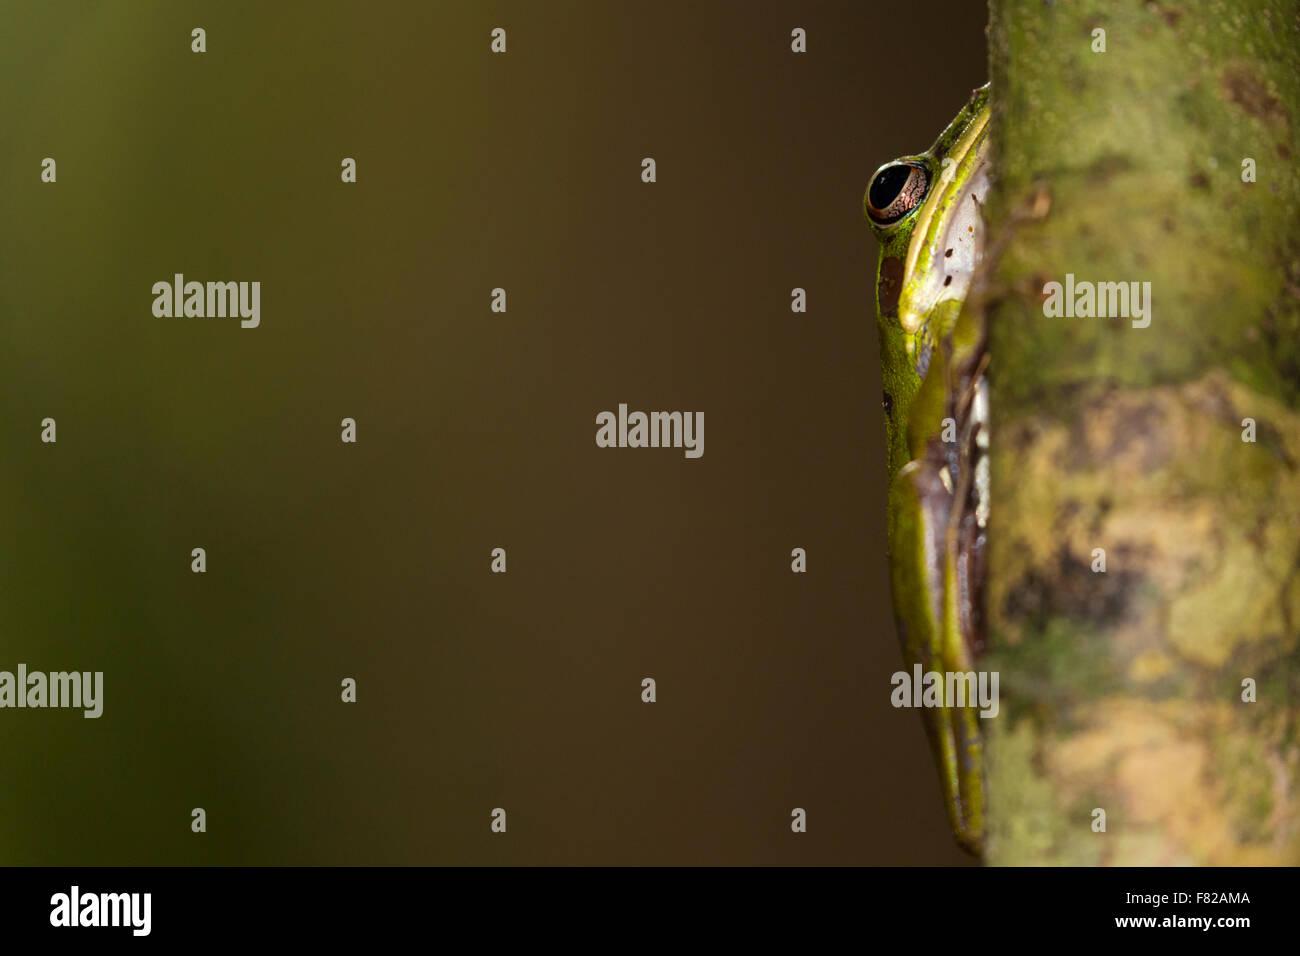 Copper cheeked frog (Hylarana raniceps) - Stock Image